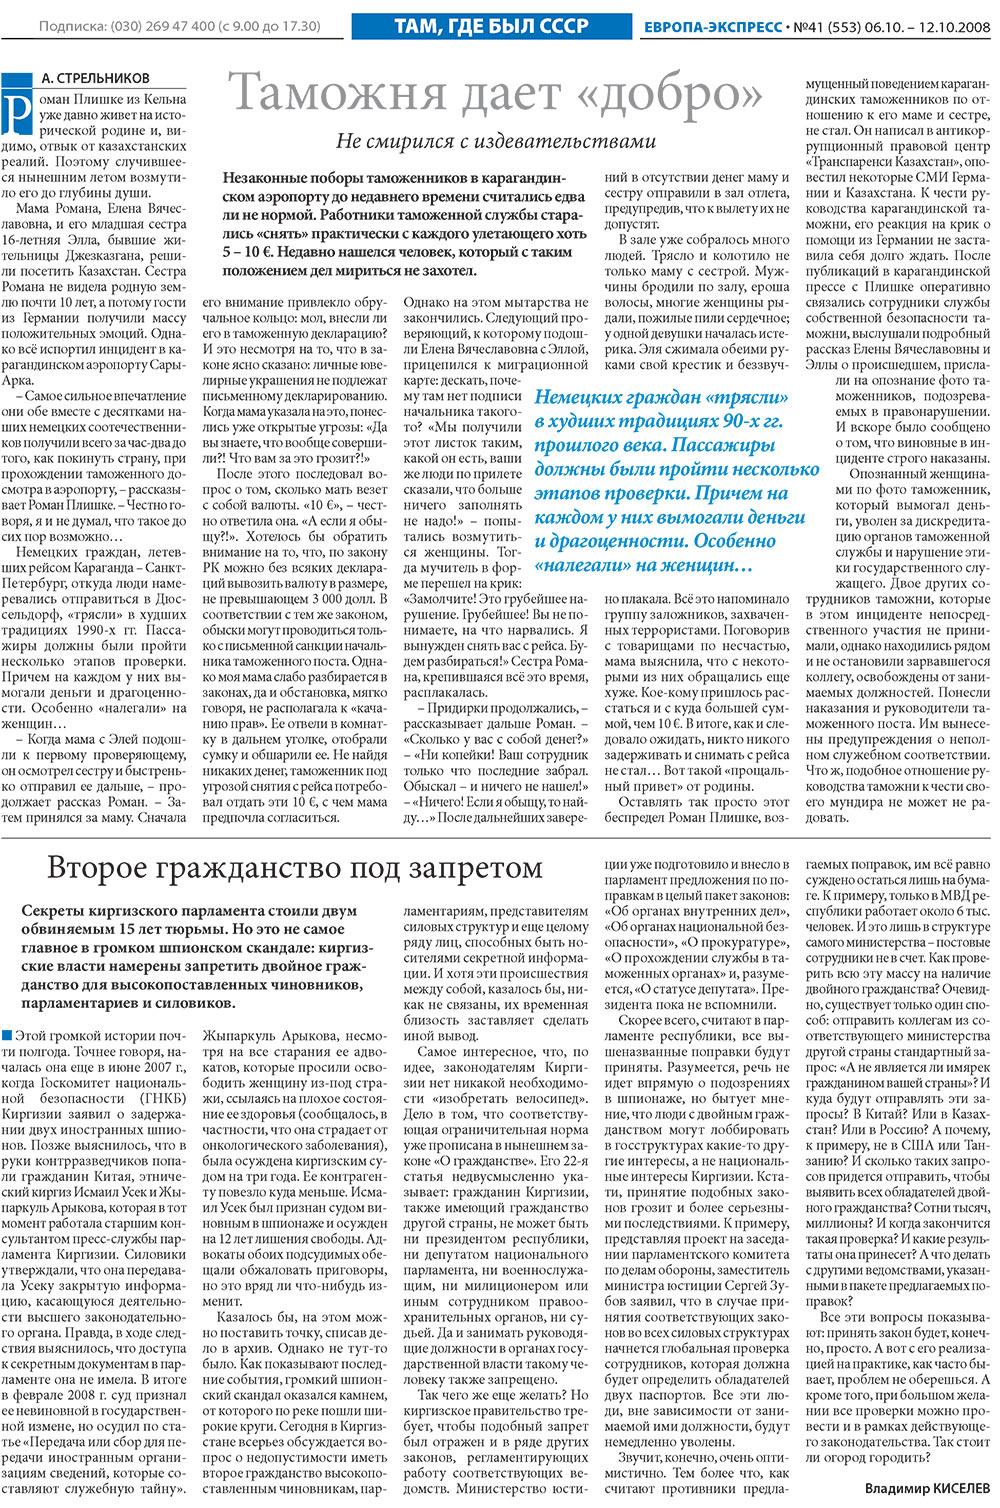 Европа экспресс (газета). 2008 год, номер 41, стр. 18